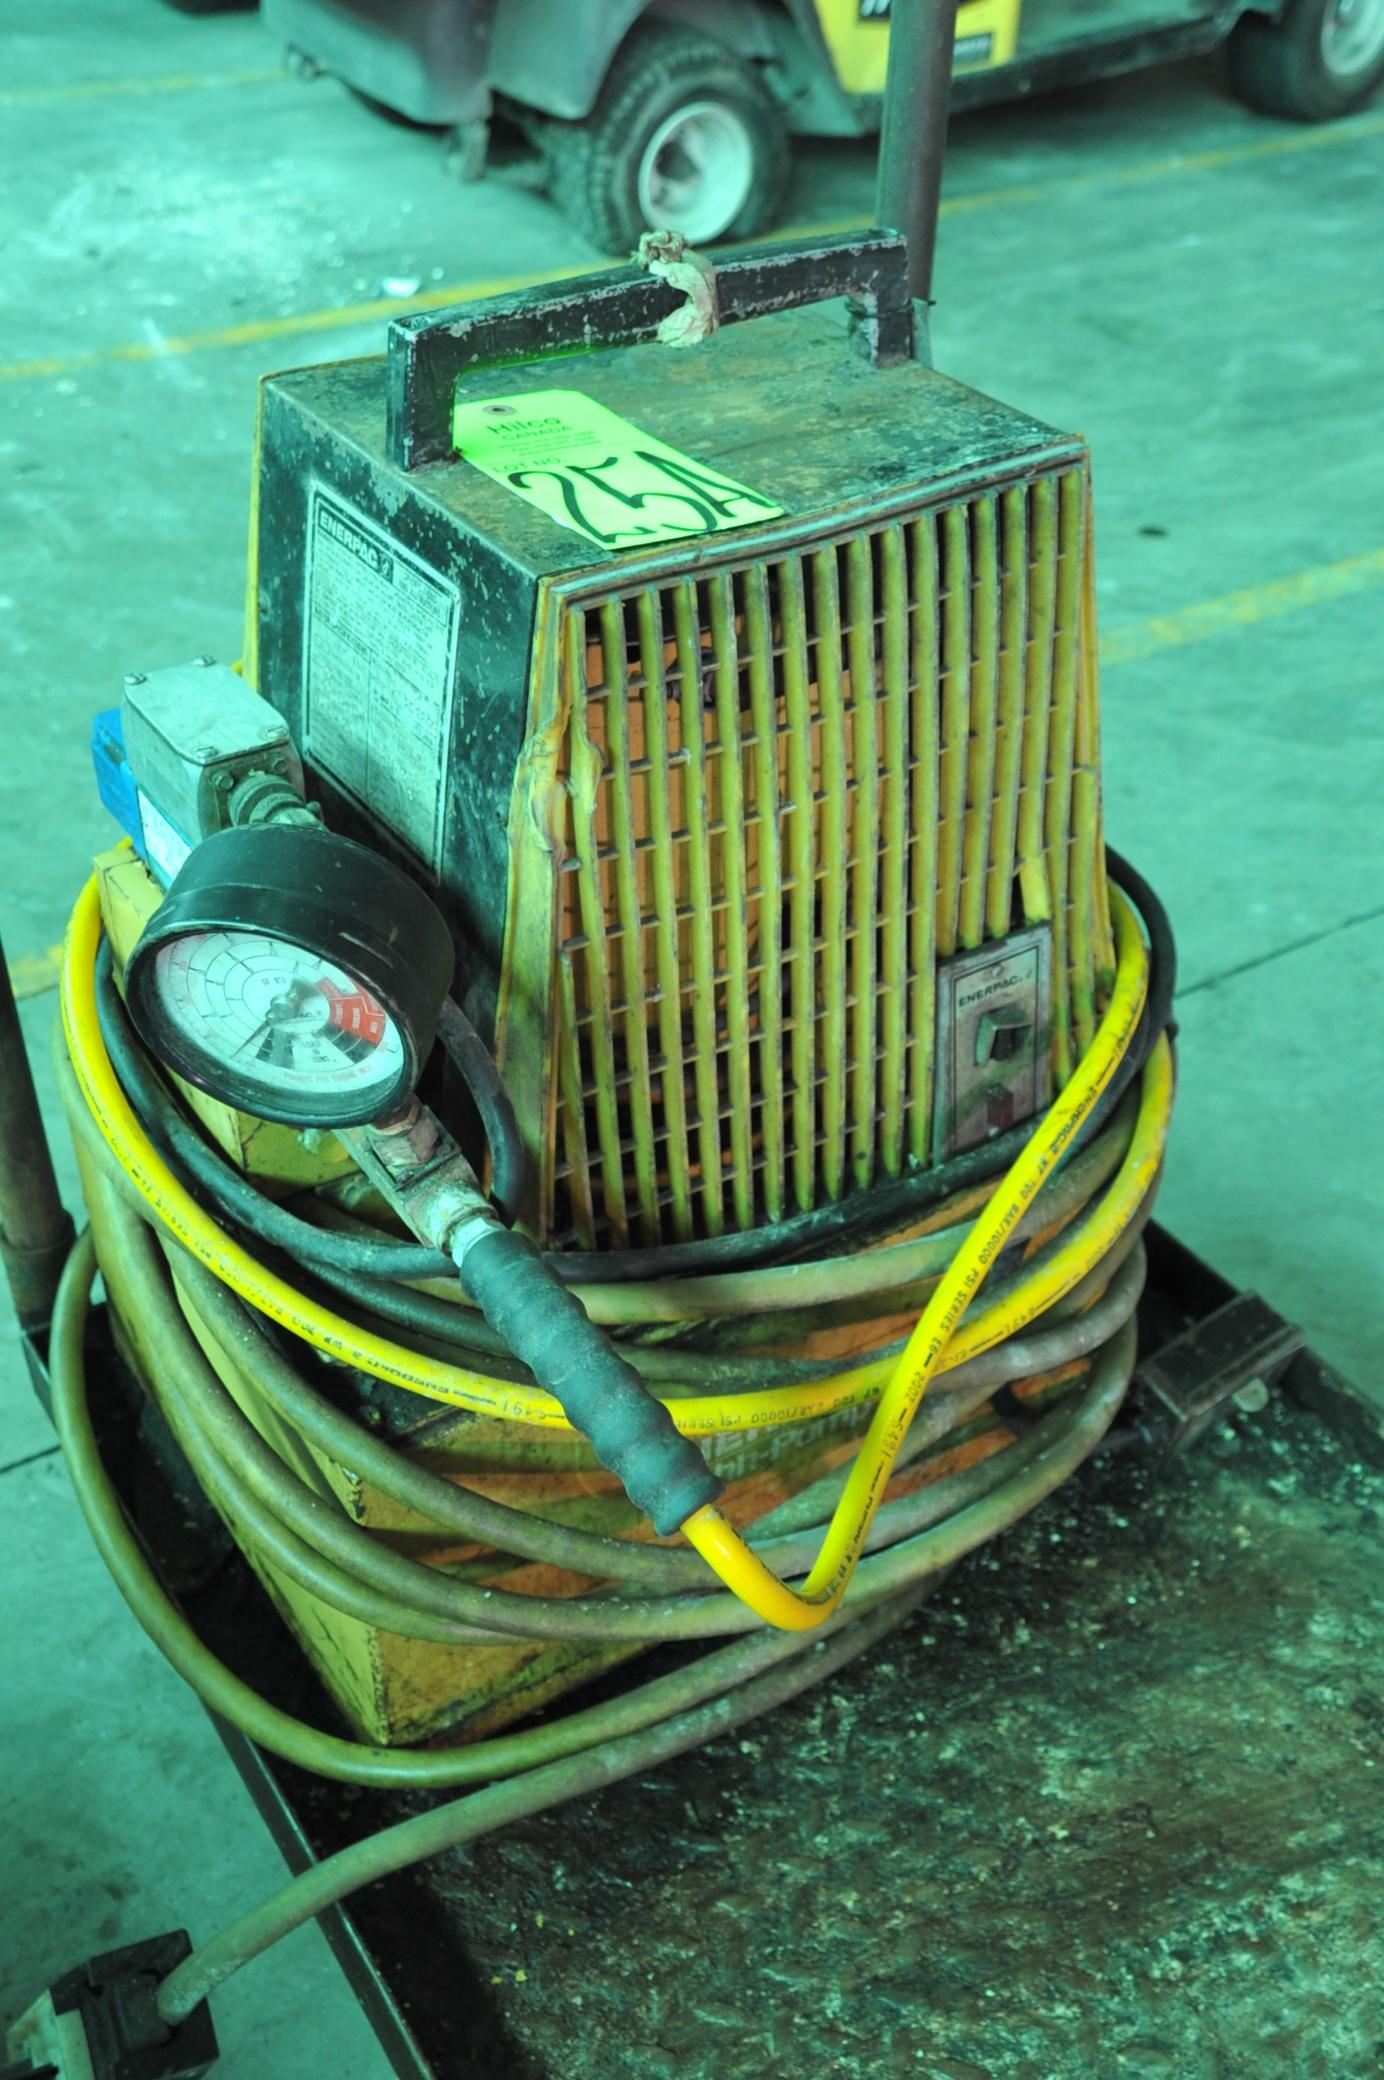 Lot 25A - Enerpac Model PER 3045 1.5 Hp, 115V, Hydraulic Power Pack